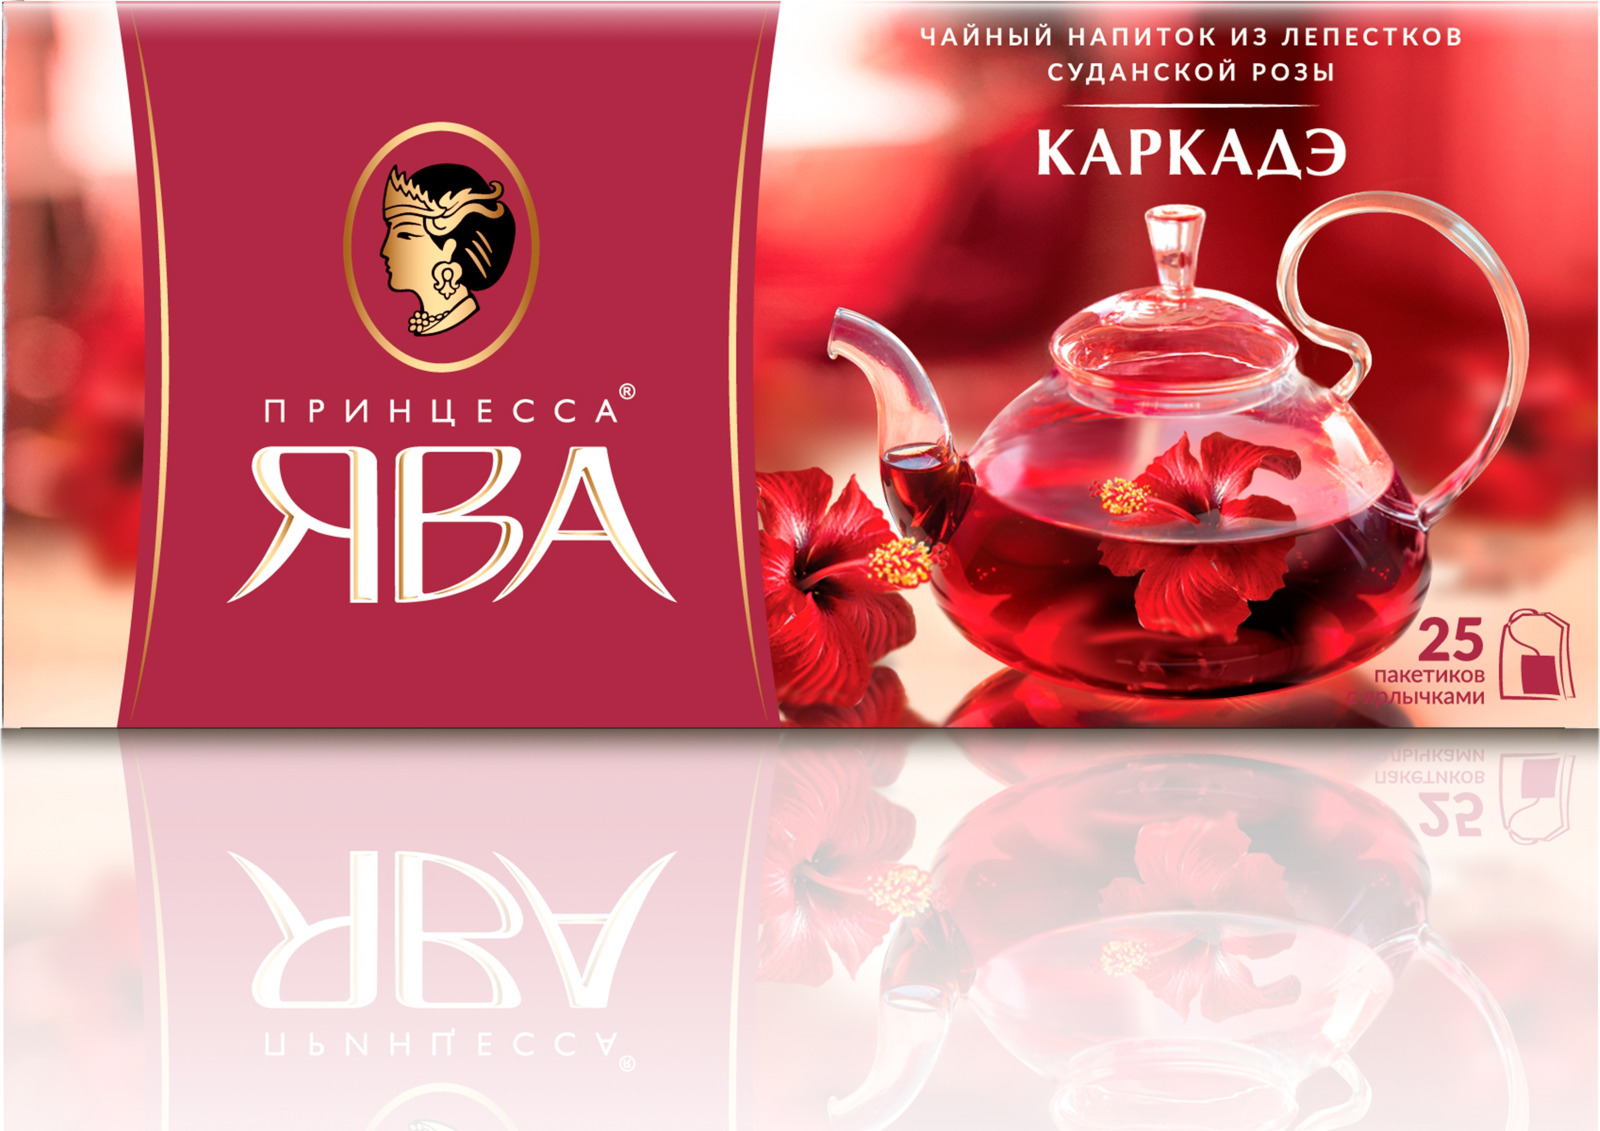 Чайный напиток в пакетиках Принцесса Ява Каркадэ, 25 шт запчасти ява харьков